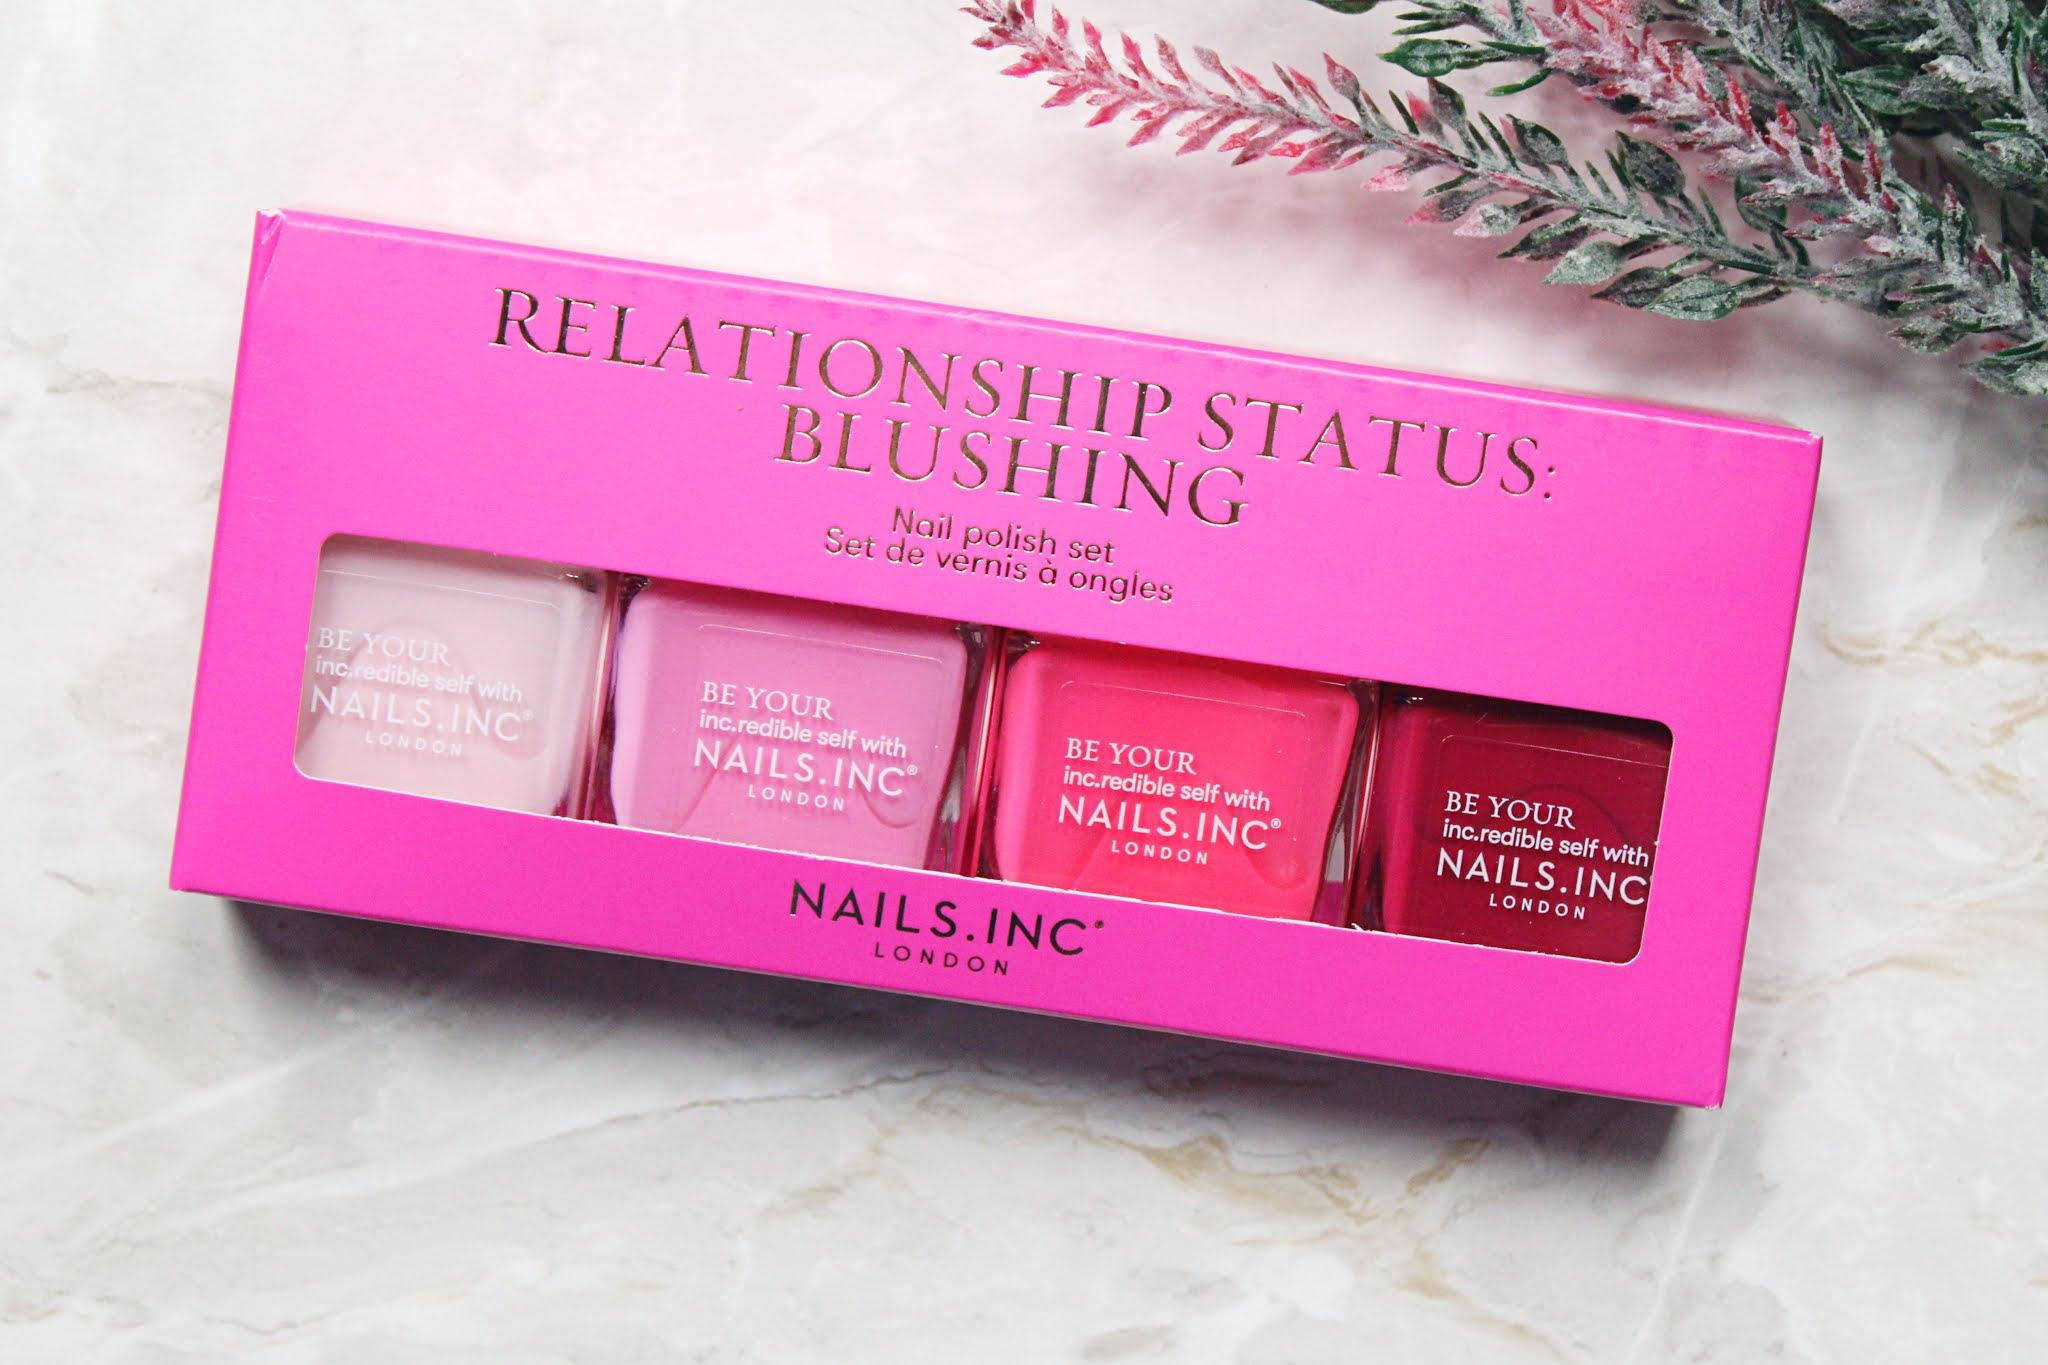 Nails Inc Relationship Status: Blushing Set Review + Swatches